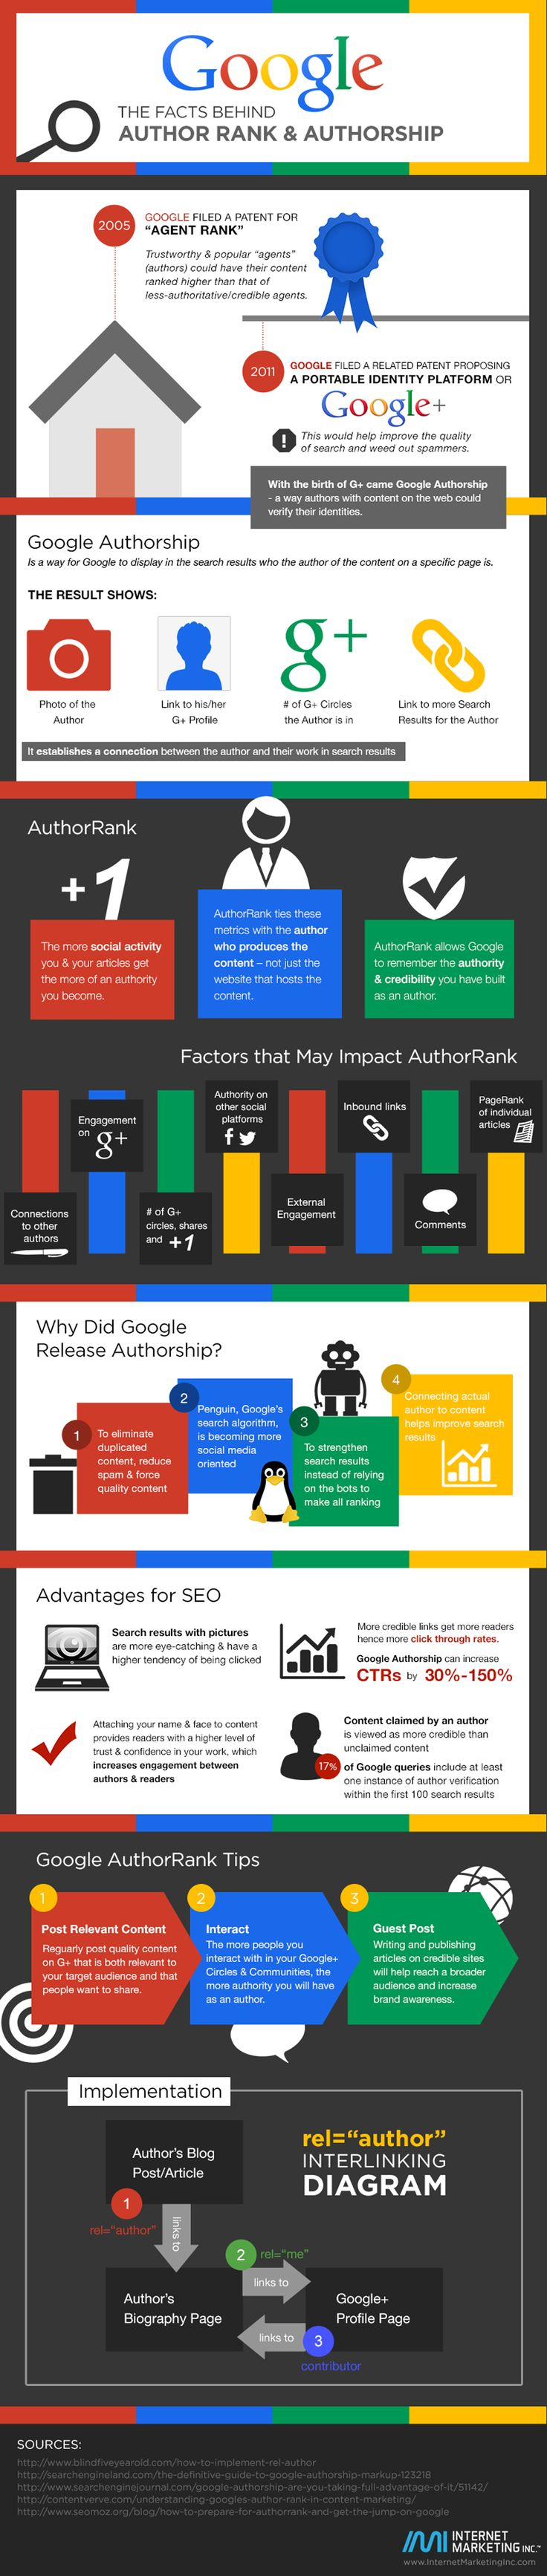 Google Authorship Infographic